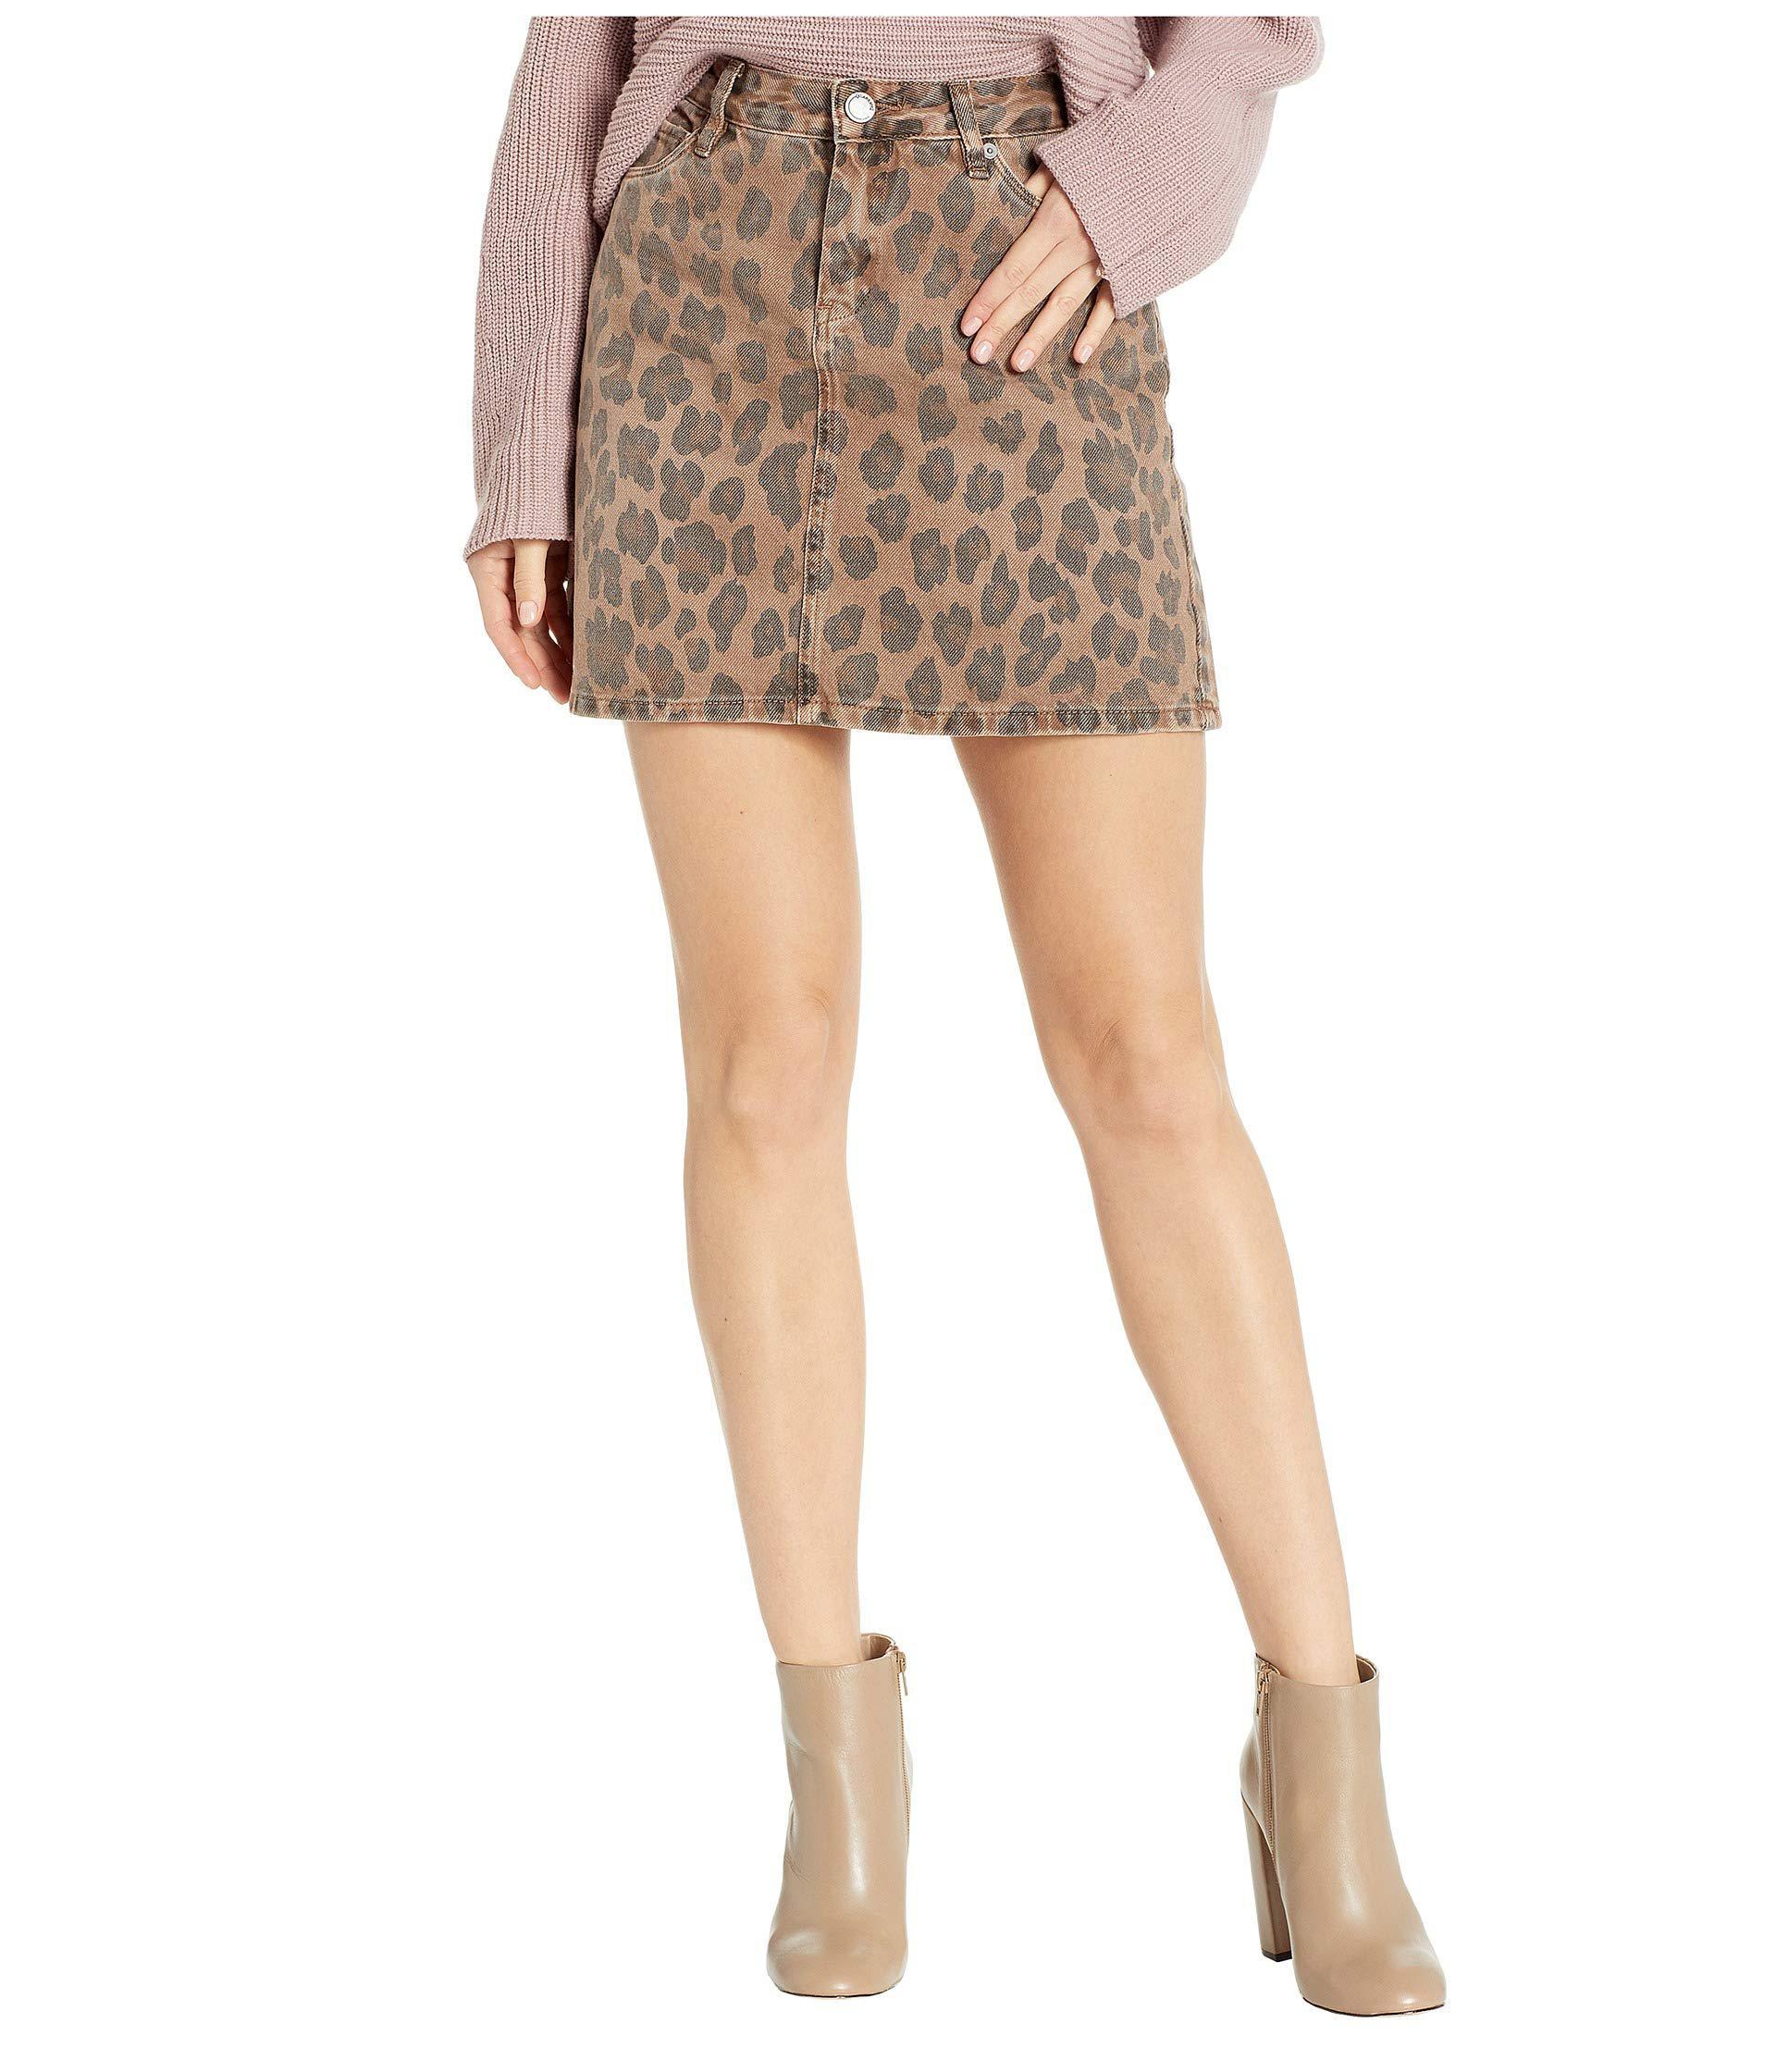 05b00cd246f Blank NYC - Multicolor Cheetah Printed Mini Skirt In Catwalk (catwalk)  Women s Skirt -. View fullscreen